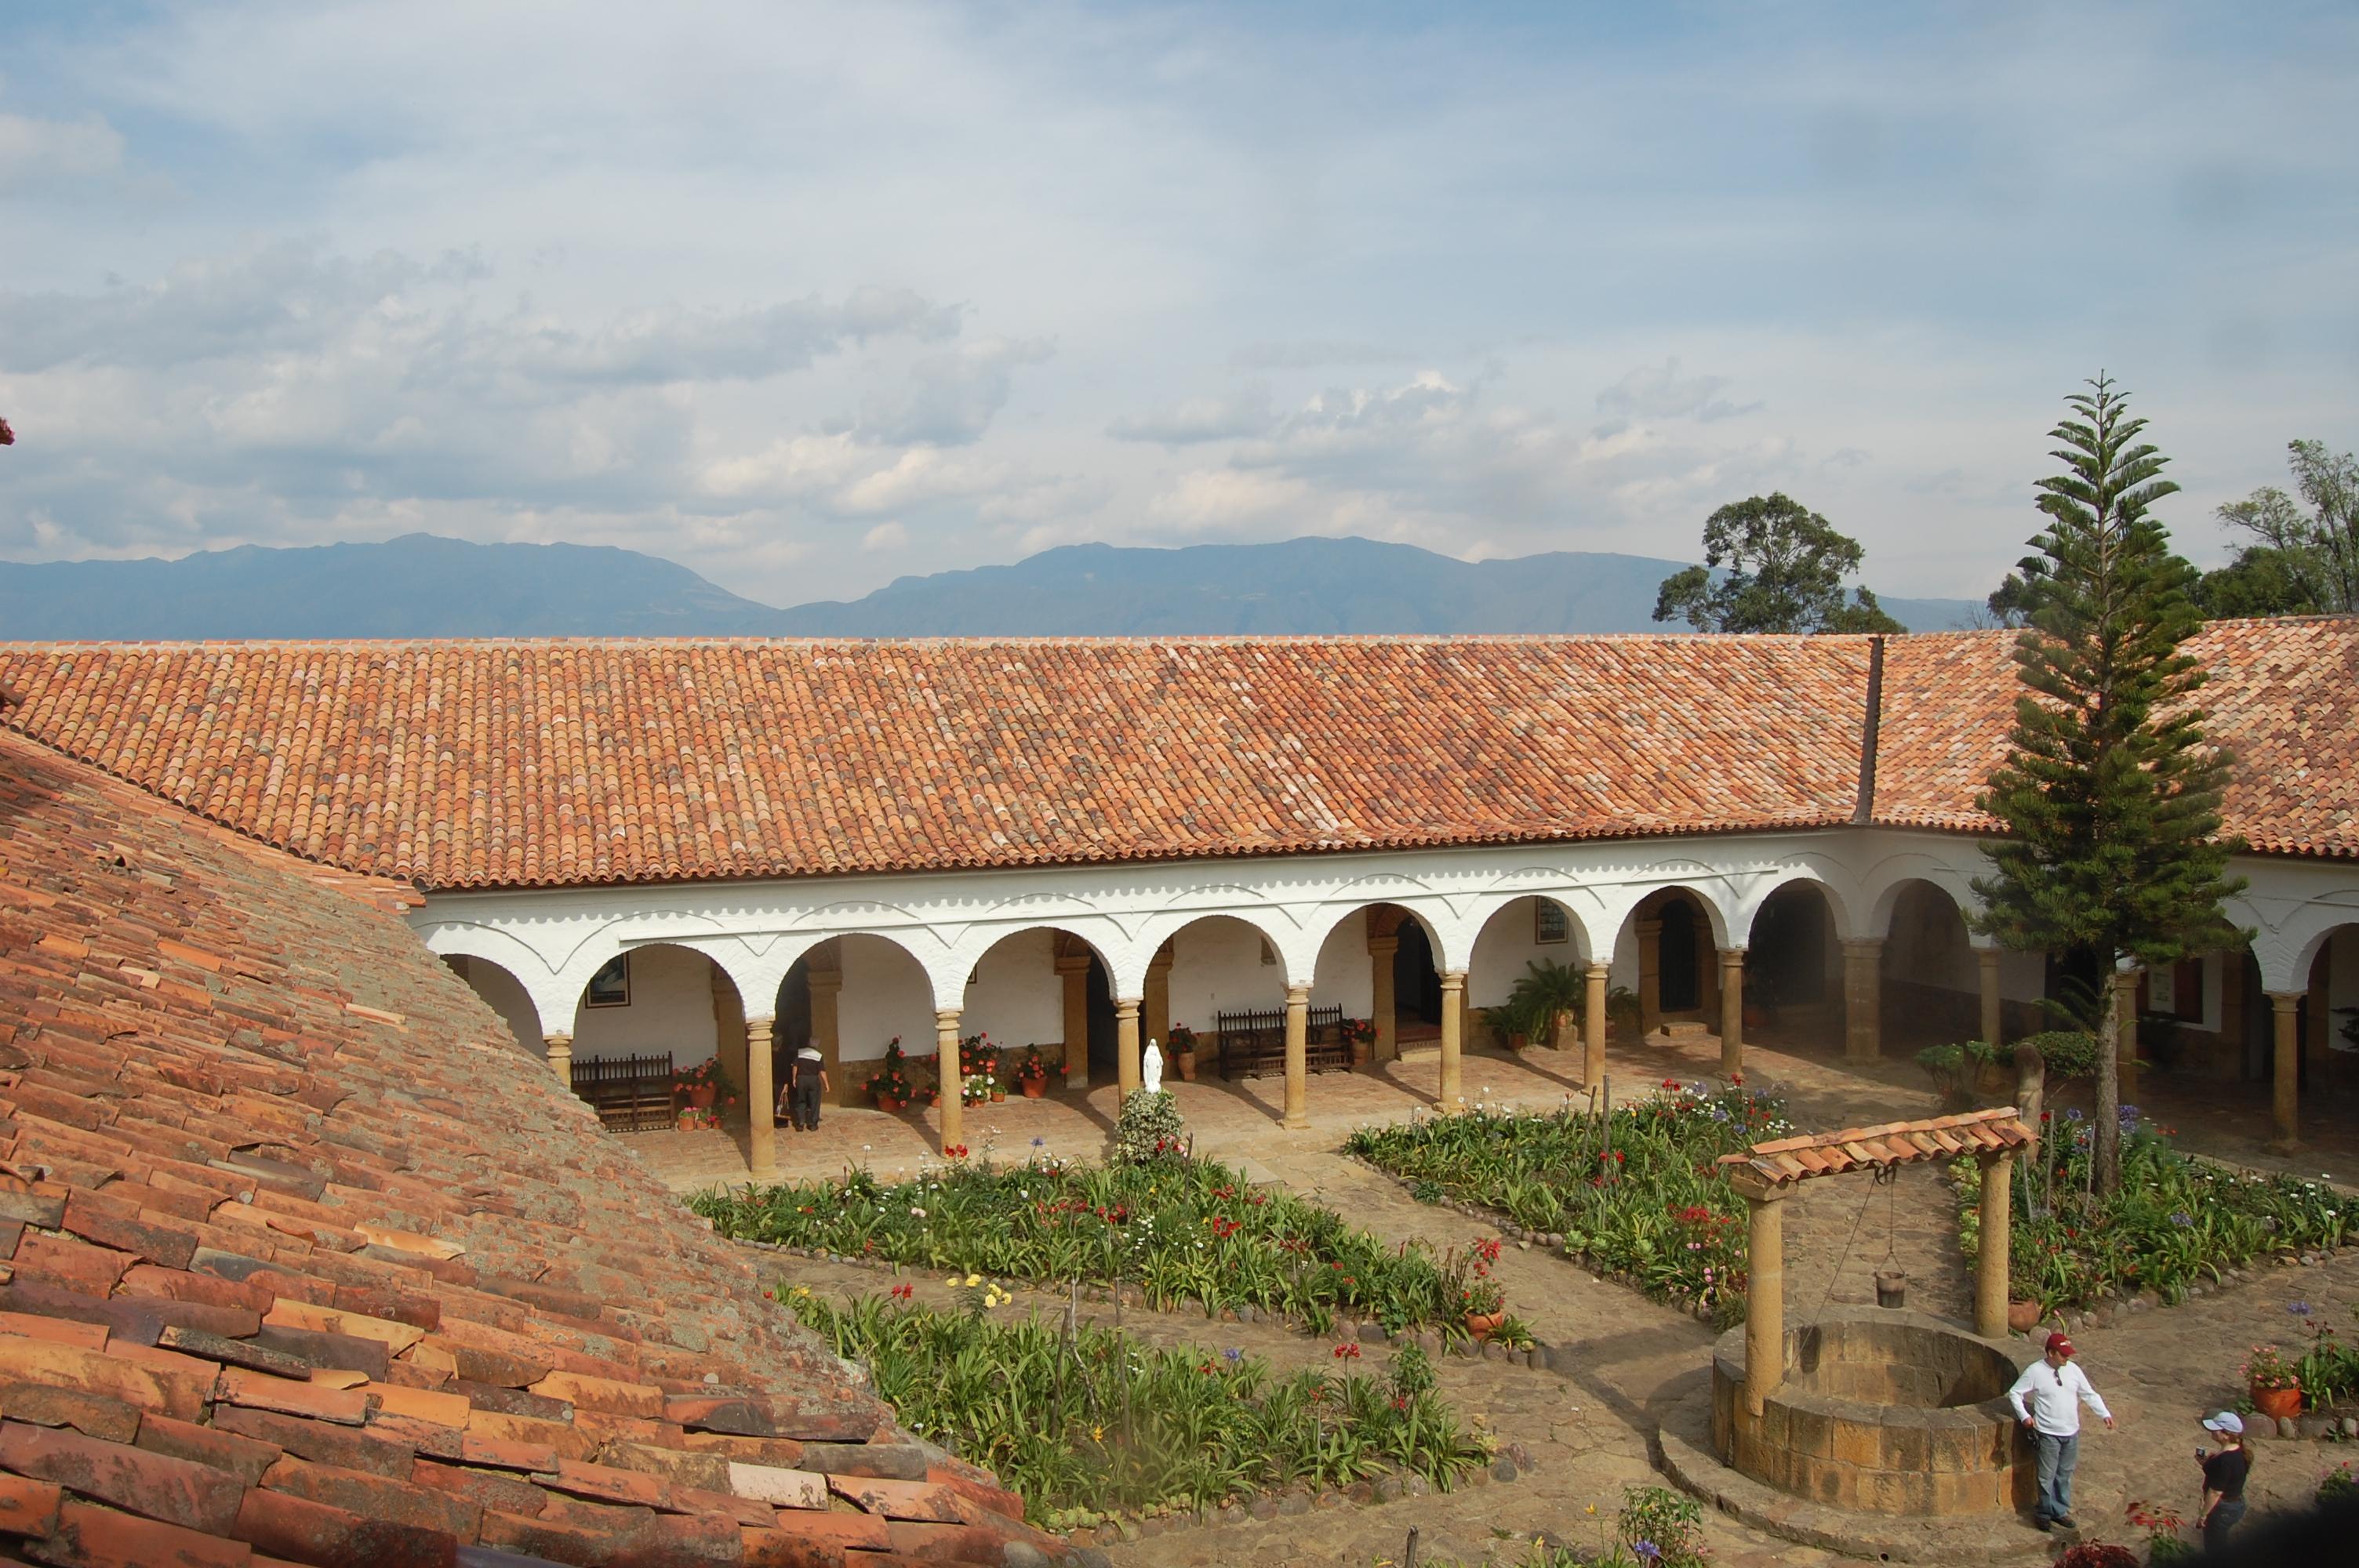 hacienda boyaca: